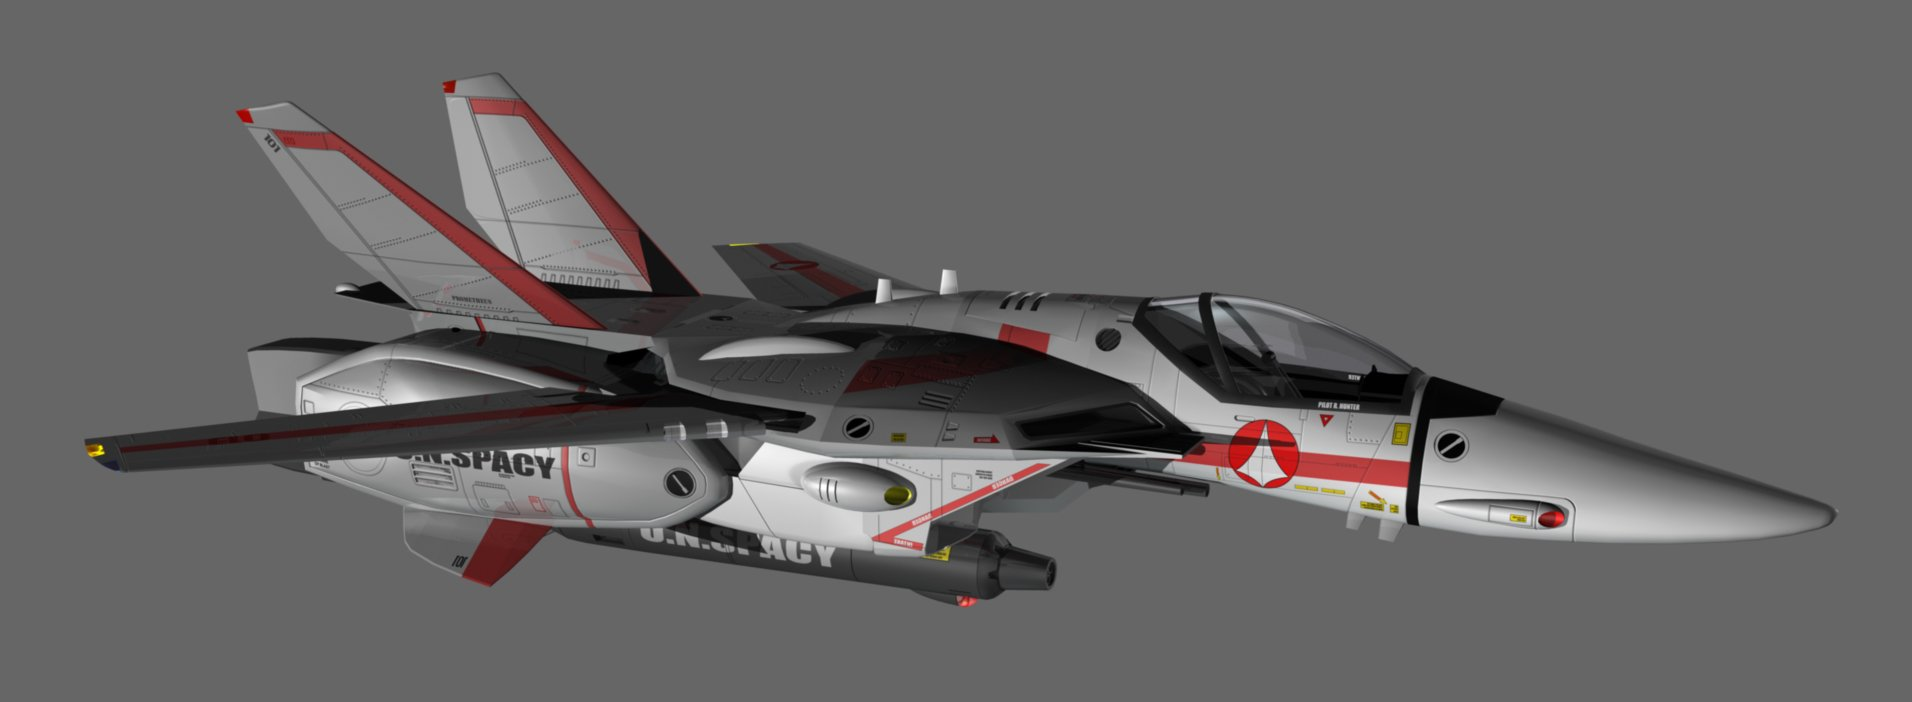 rick jet 2.jpg